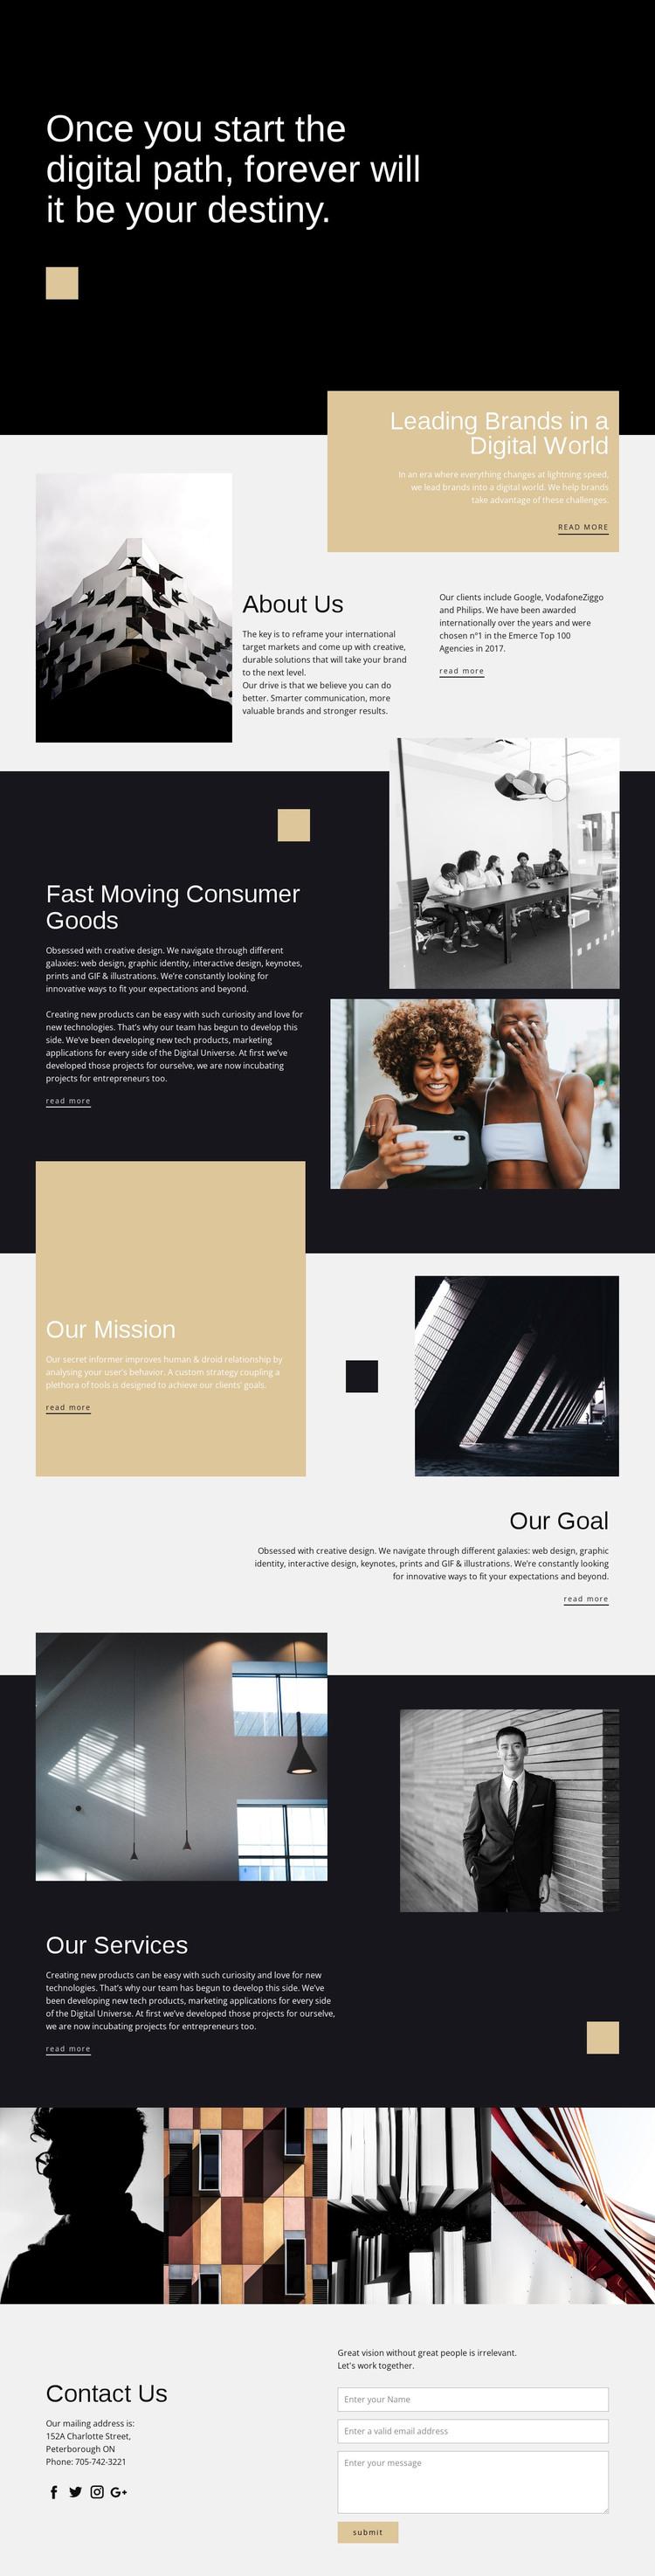 Destiny photo studio WordPress Theme